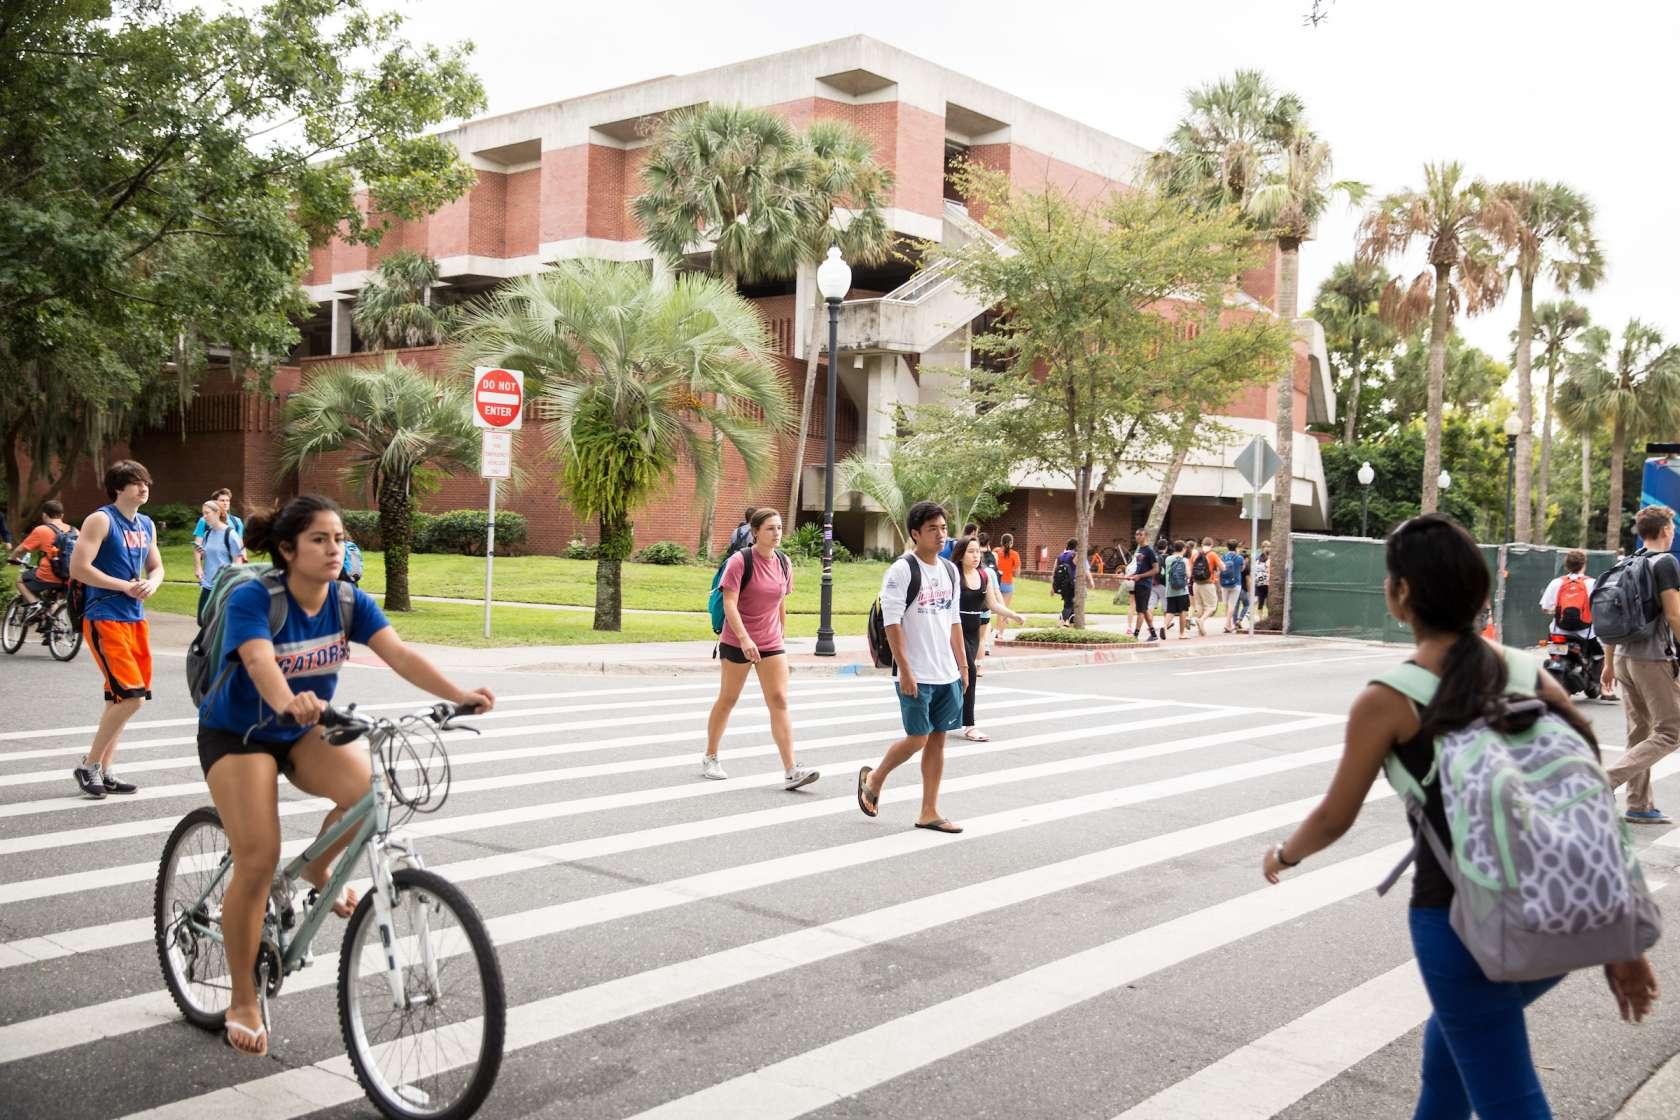 Students use crosswalk on campus